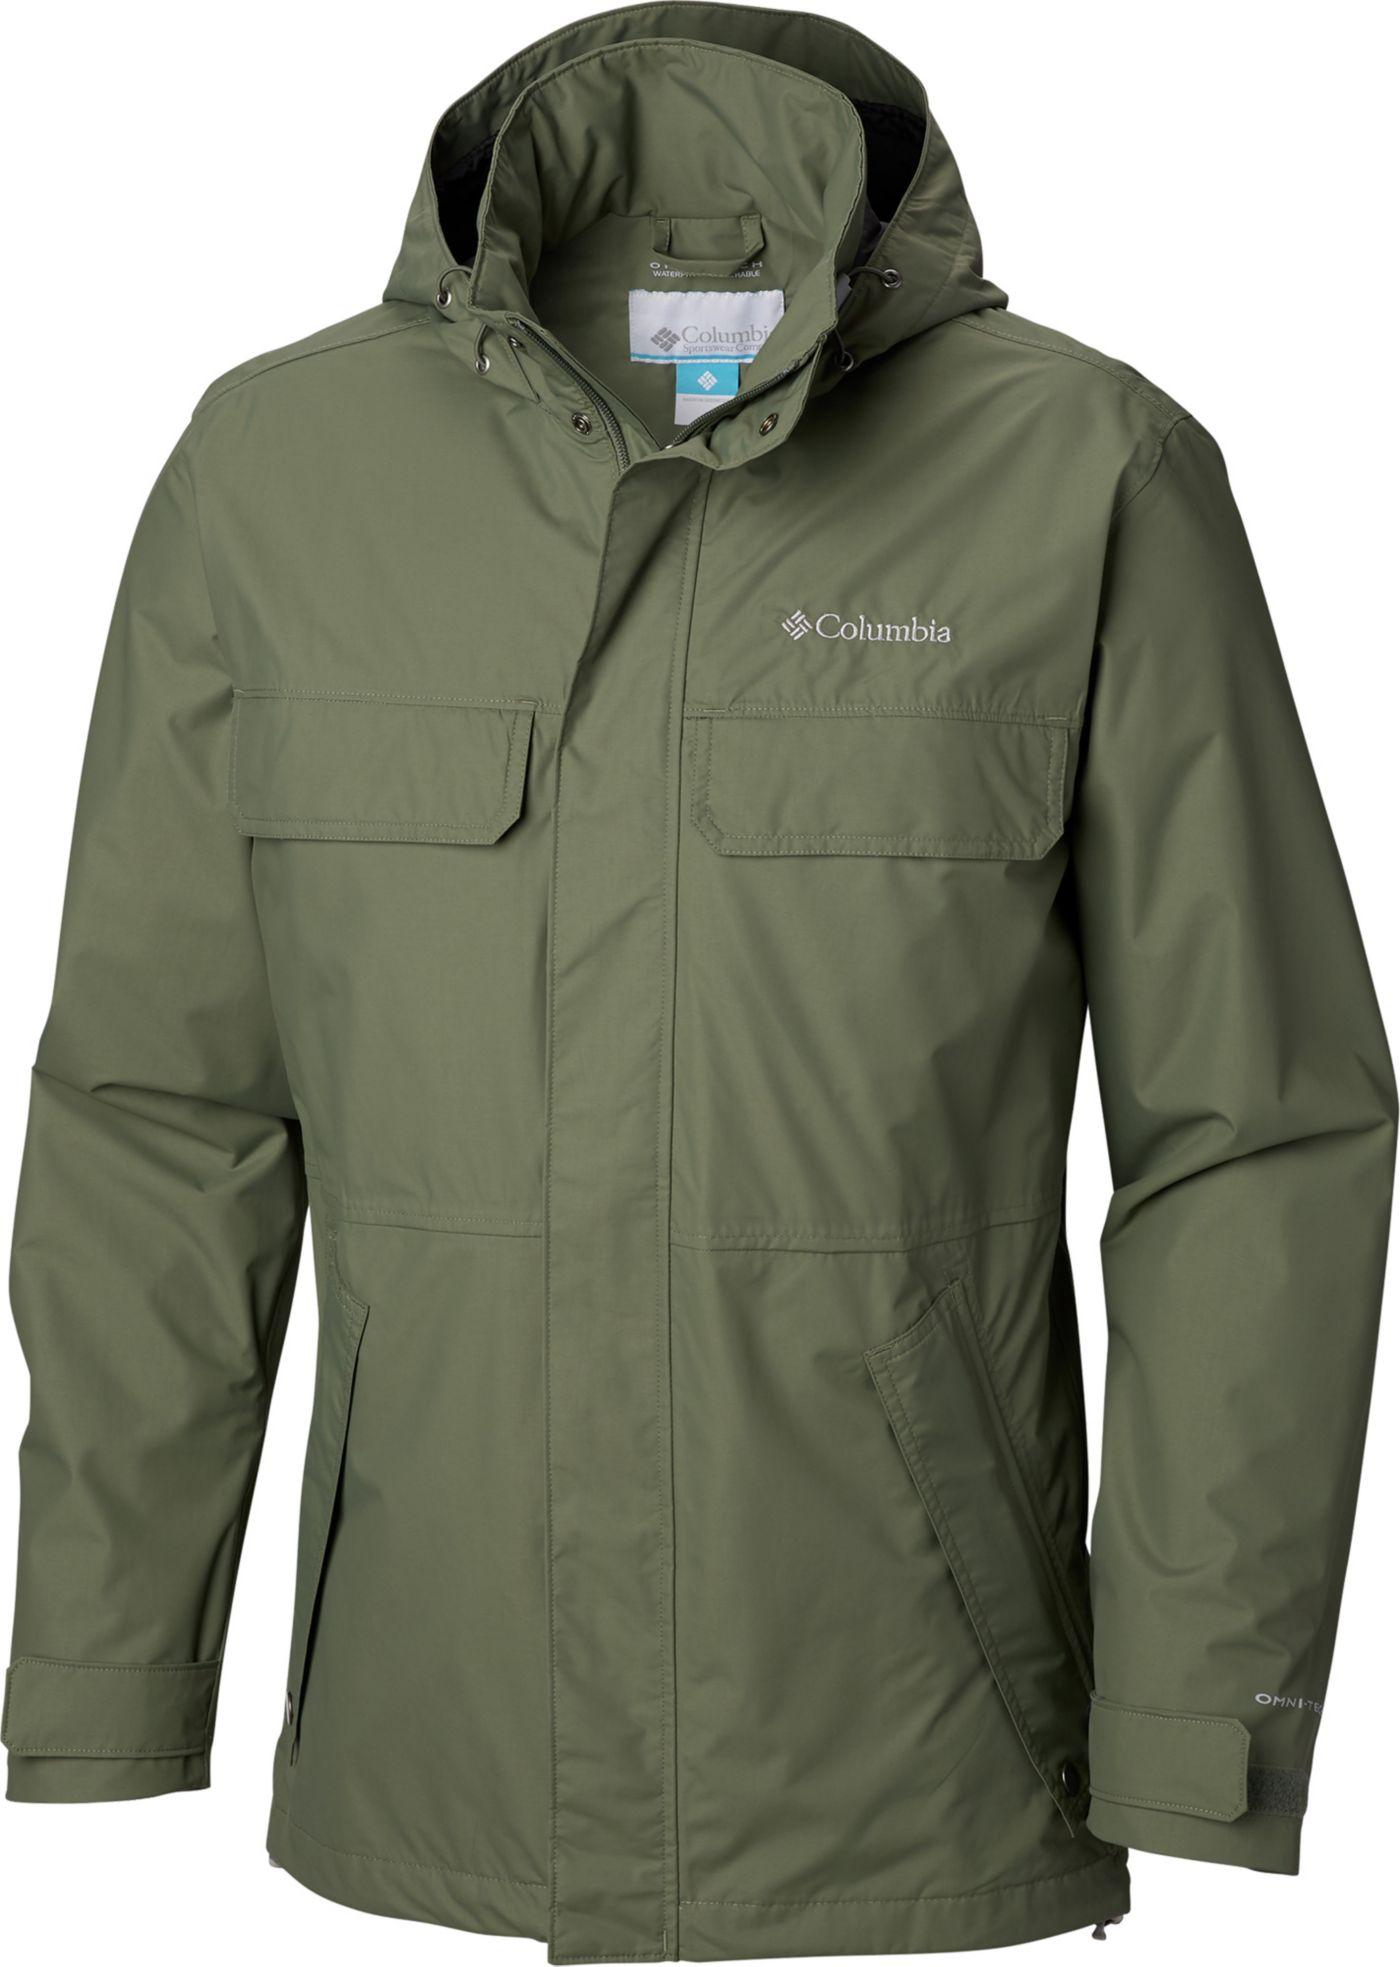 Columbia Men's Dr. DownPour II Rain Jacket